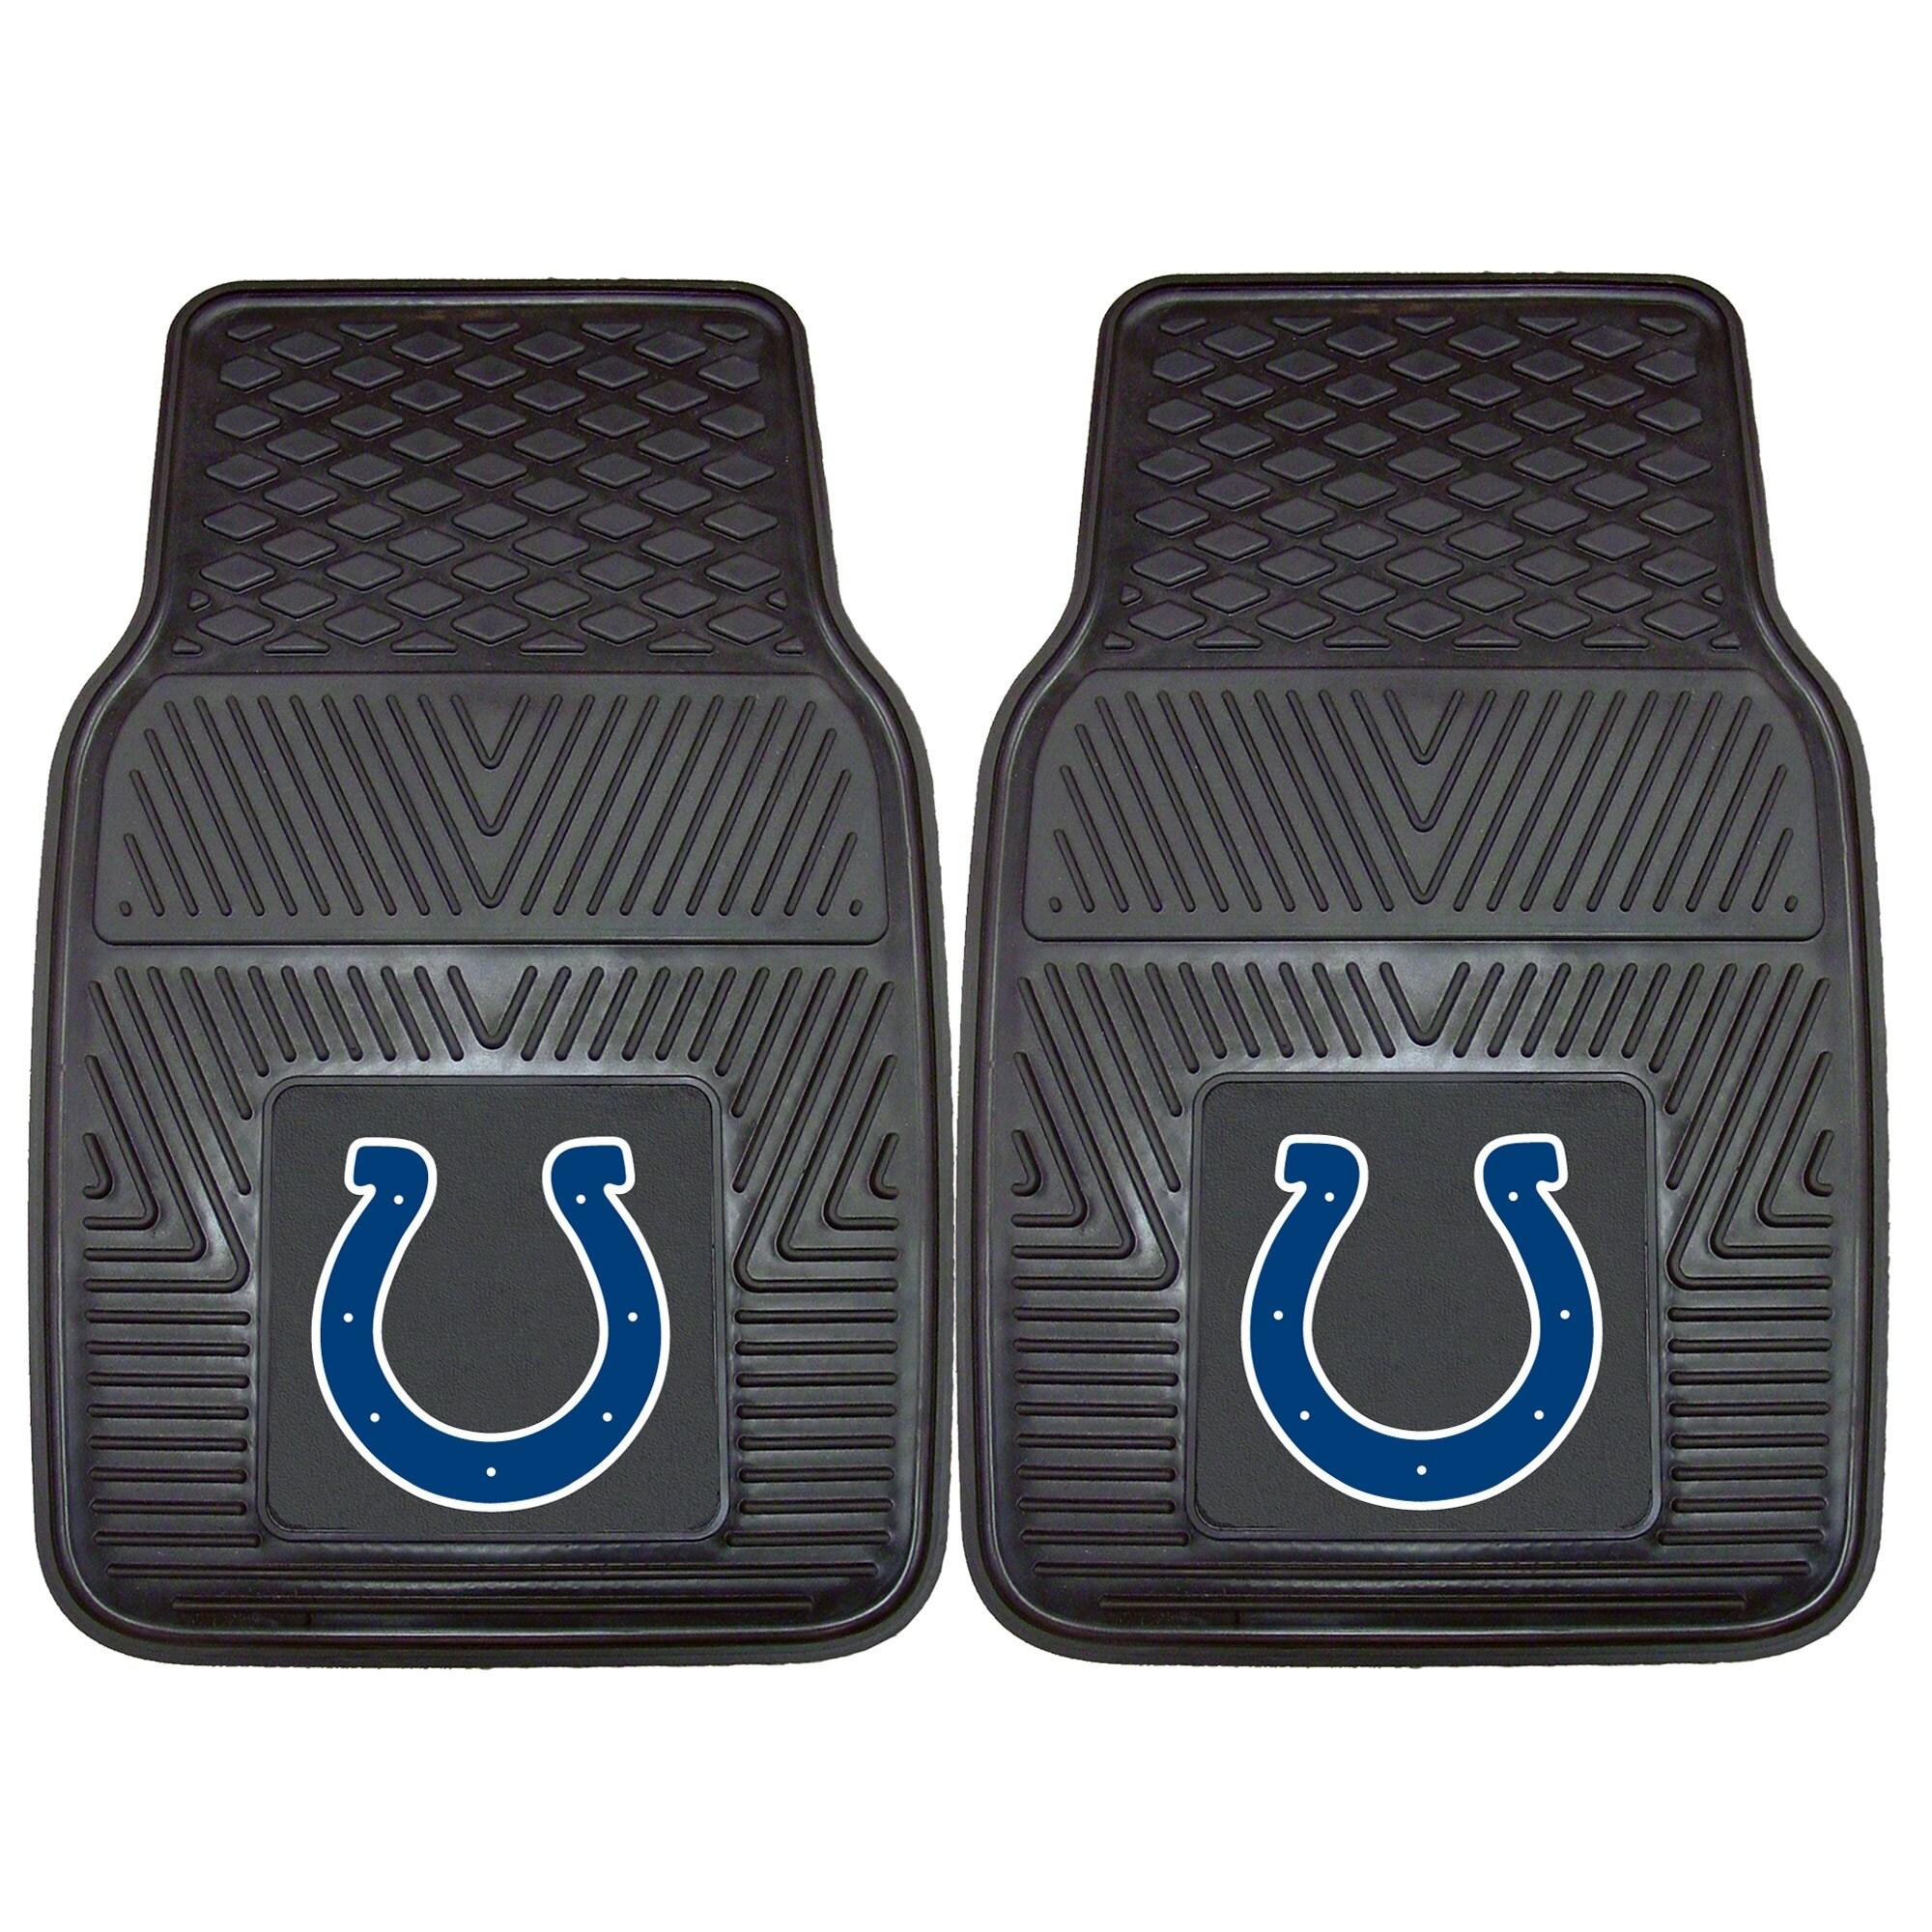 "Indianapolis Colts 27"" x 18"" 2-Pack Vinyl Car Mat Set"